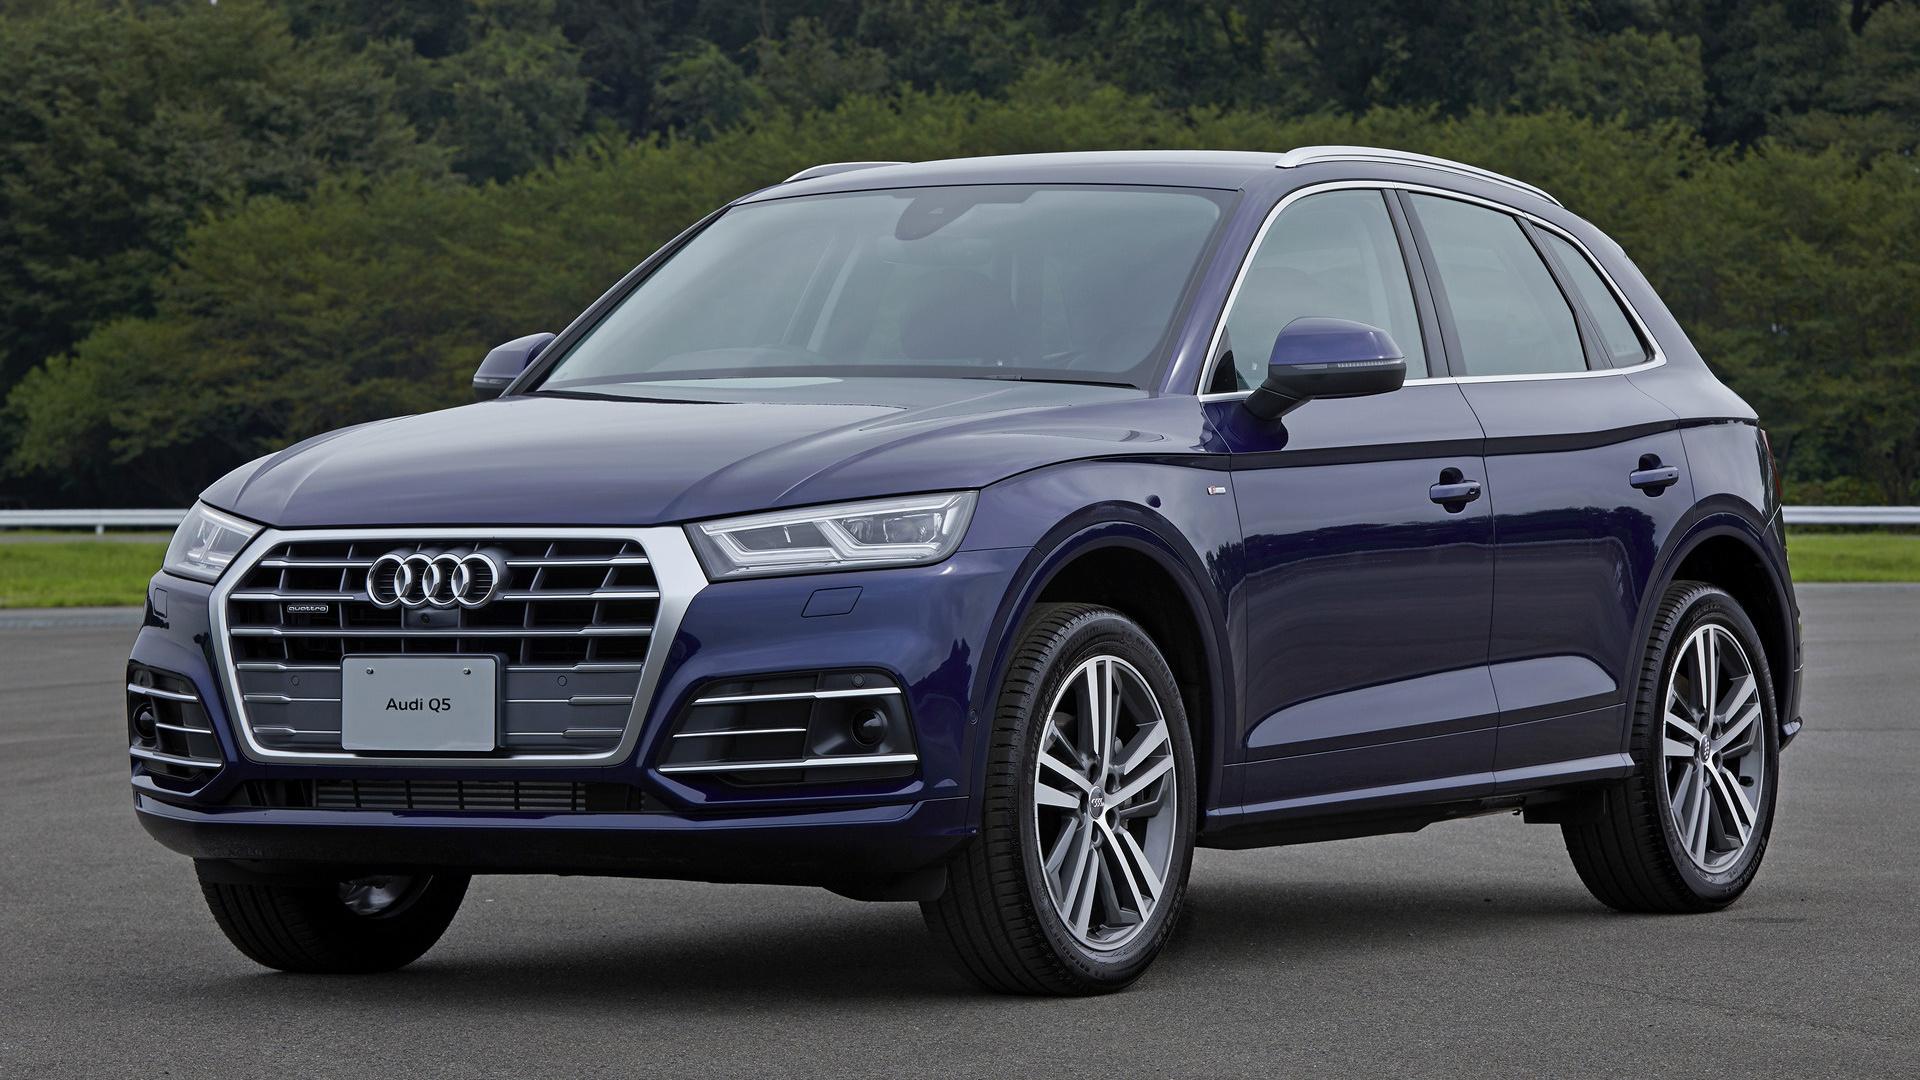 Audi Q5 S line (2017) JP Wallpapers and HD Images - Car Pixel